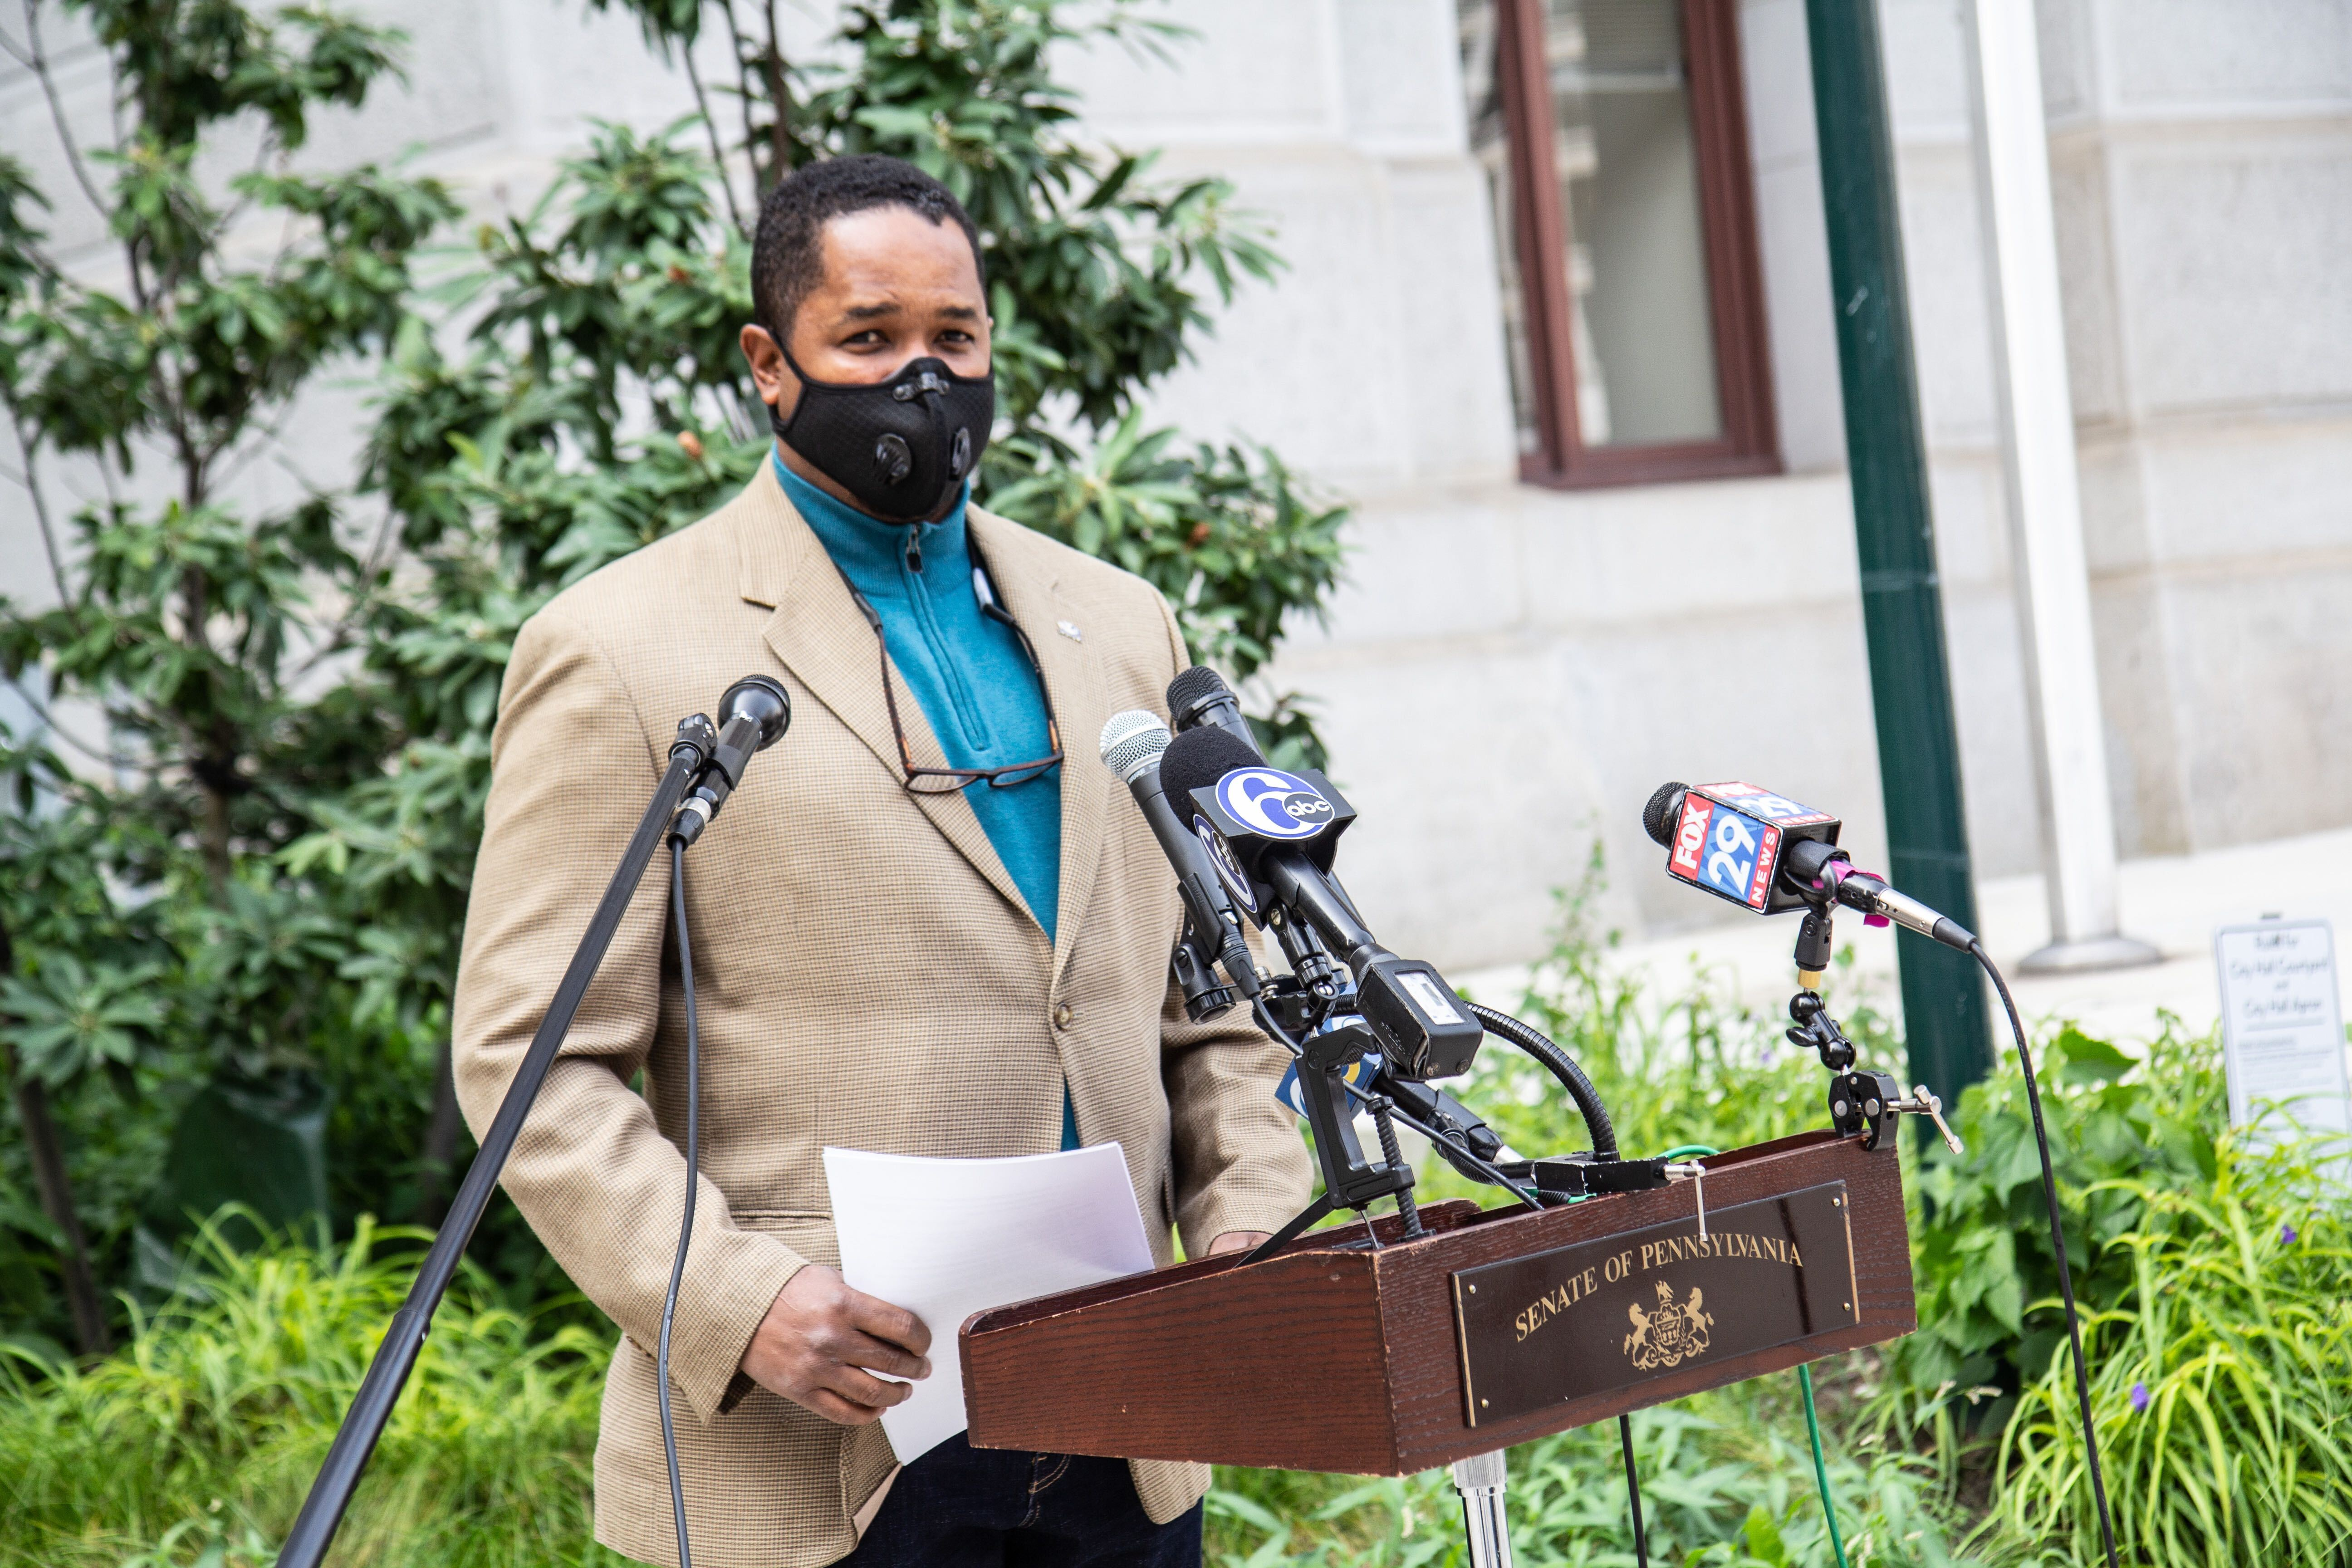 Pennsylvania State Sen. Sharif Street speaks from behind a podium